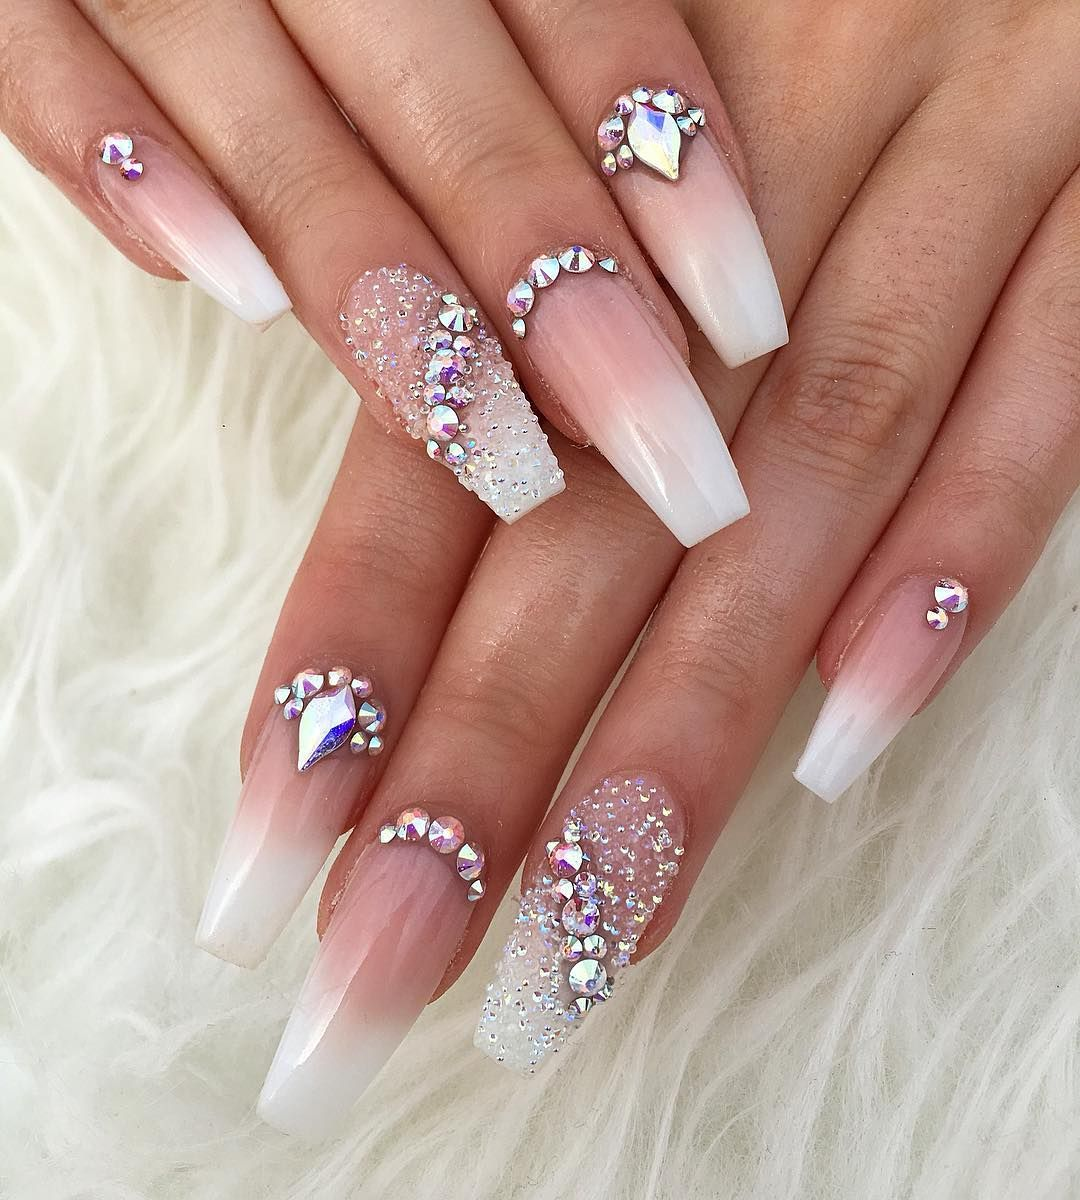 pin cloverpicker nails